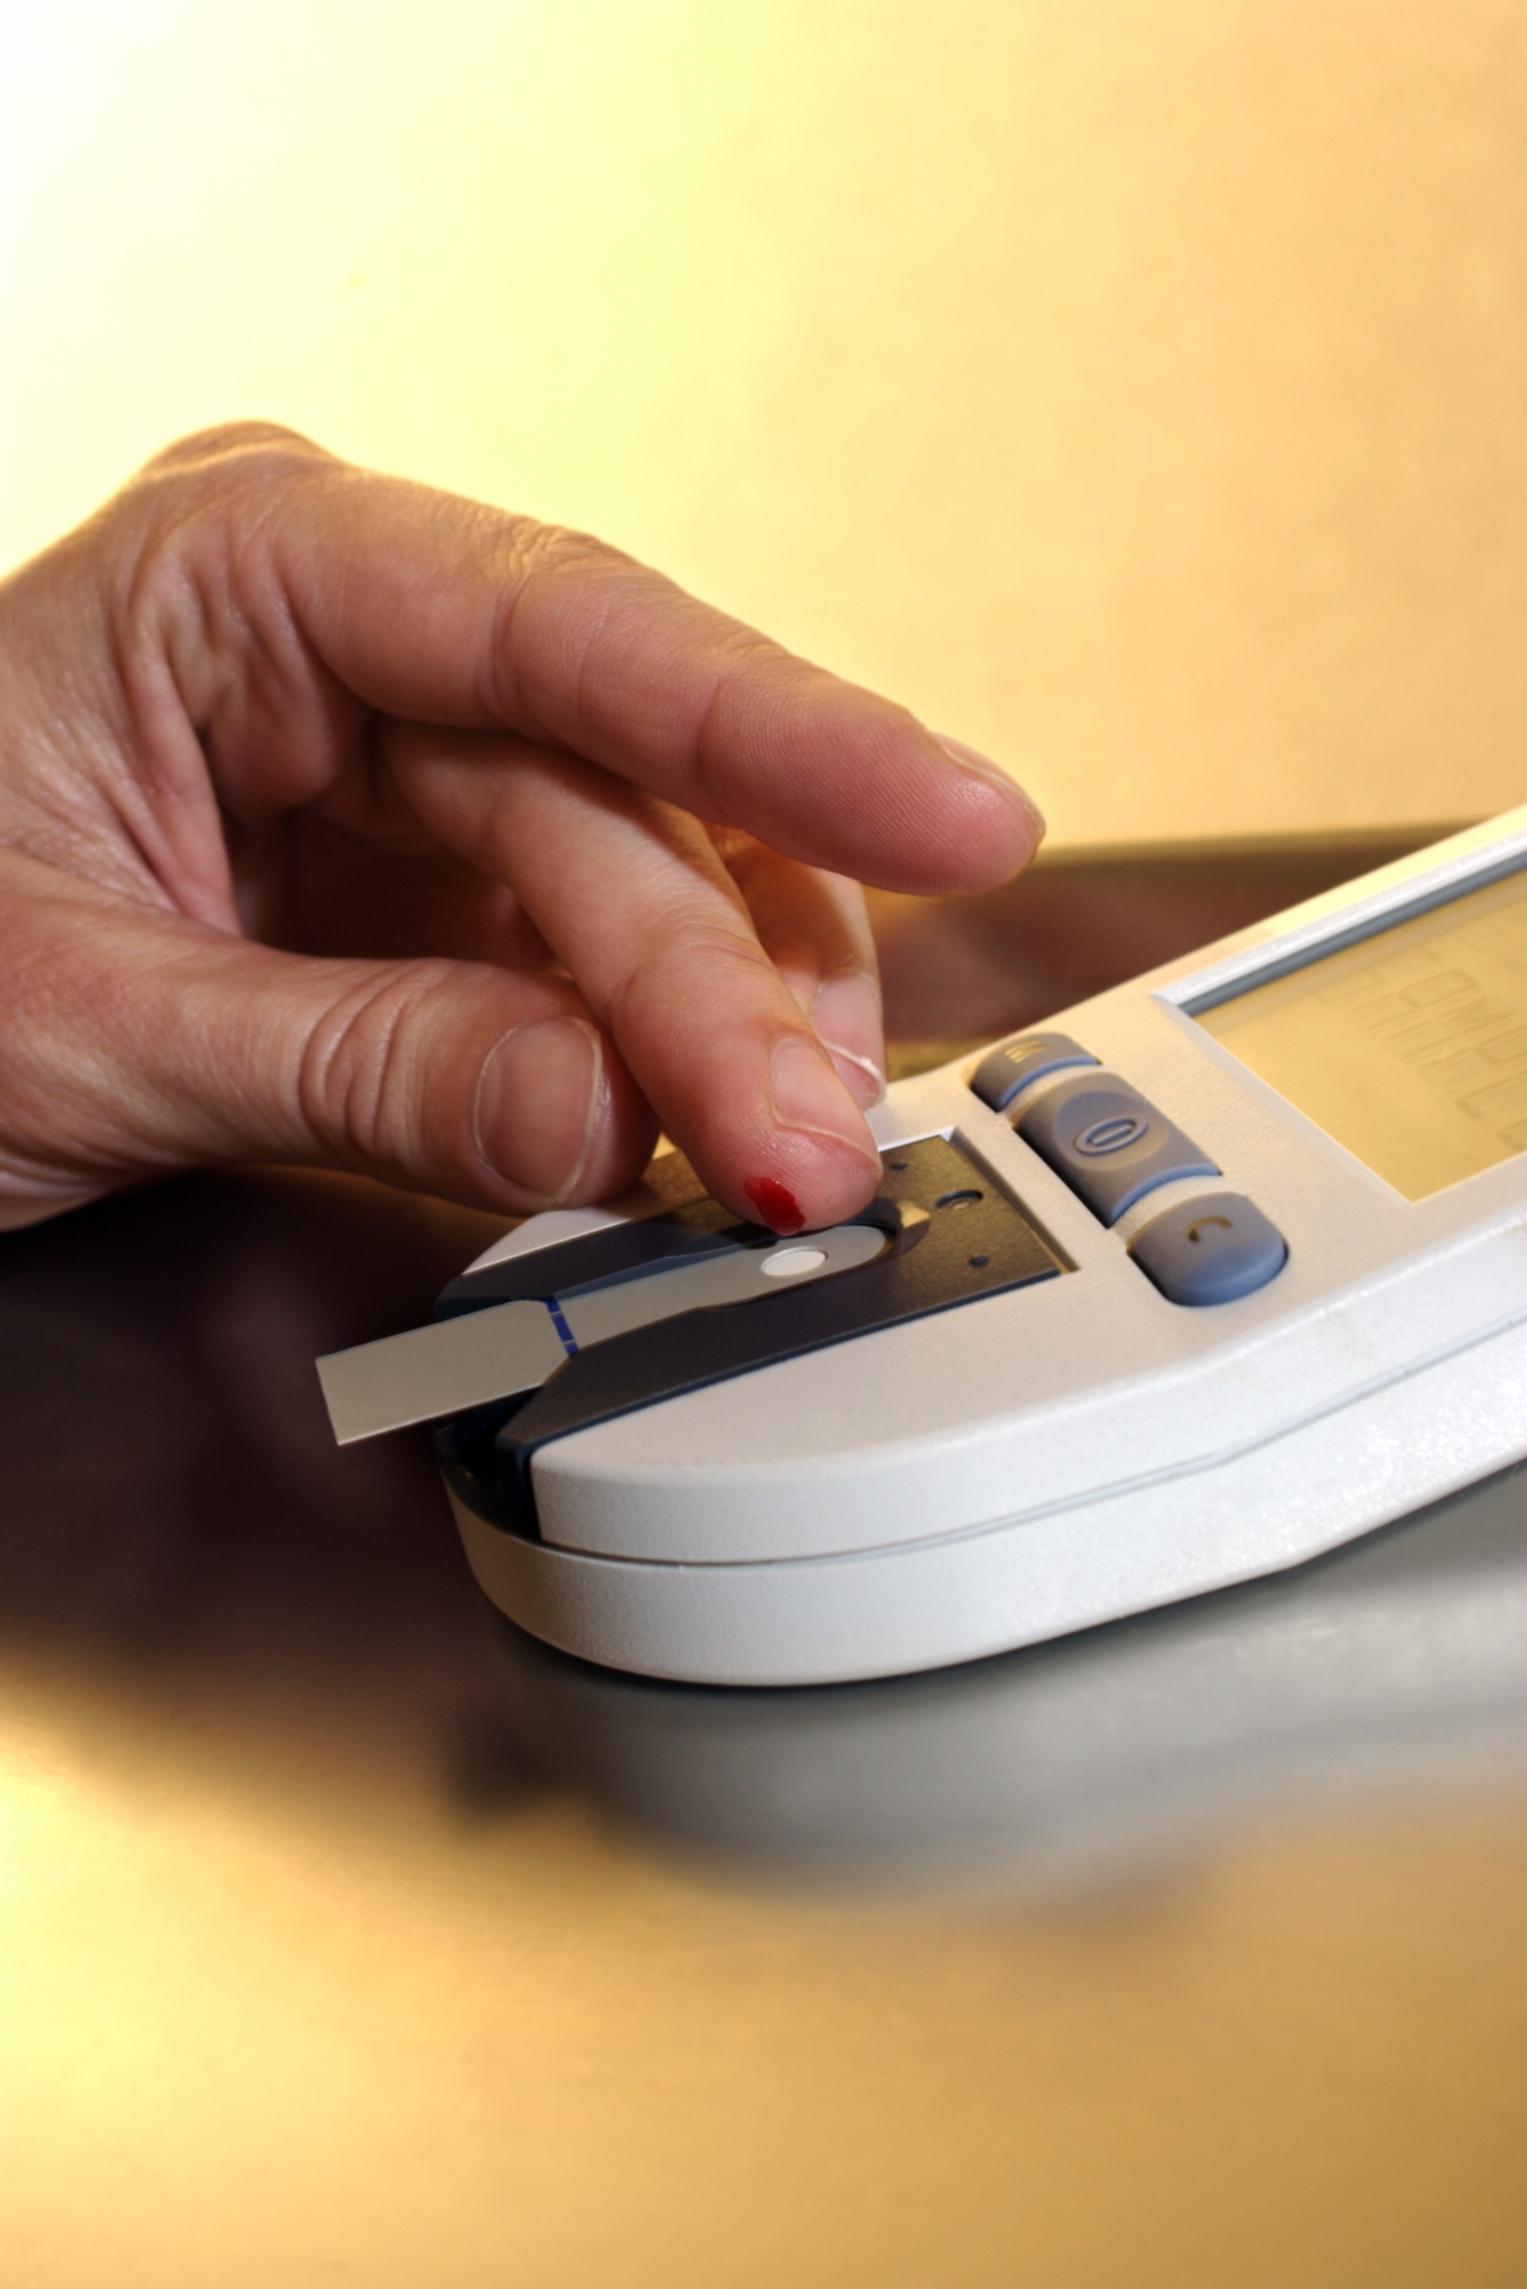 Careful monitoring of blood-sugar levels helps keep glucose level.